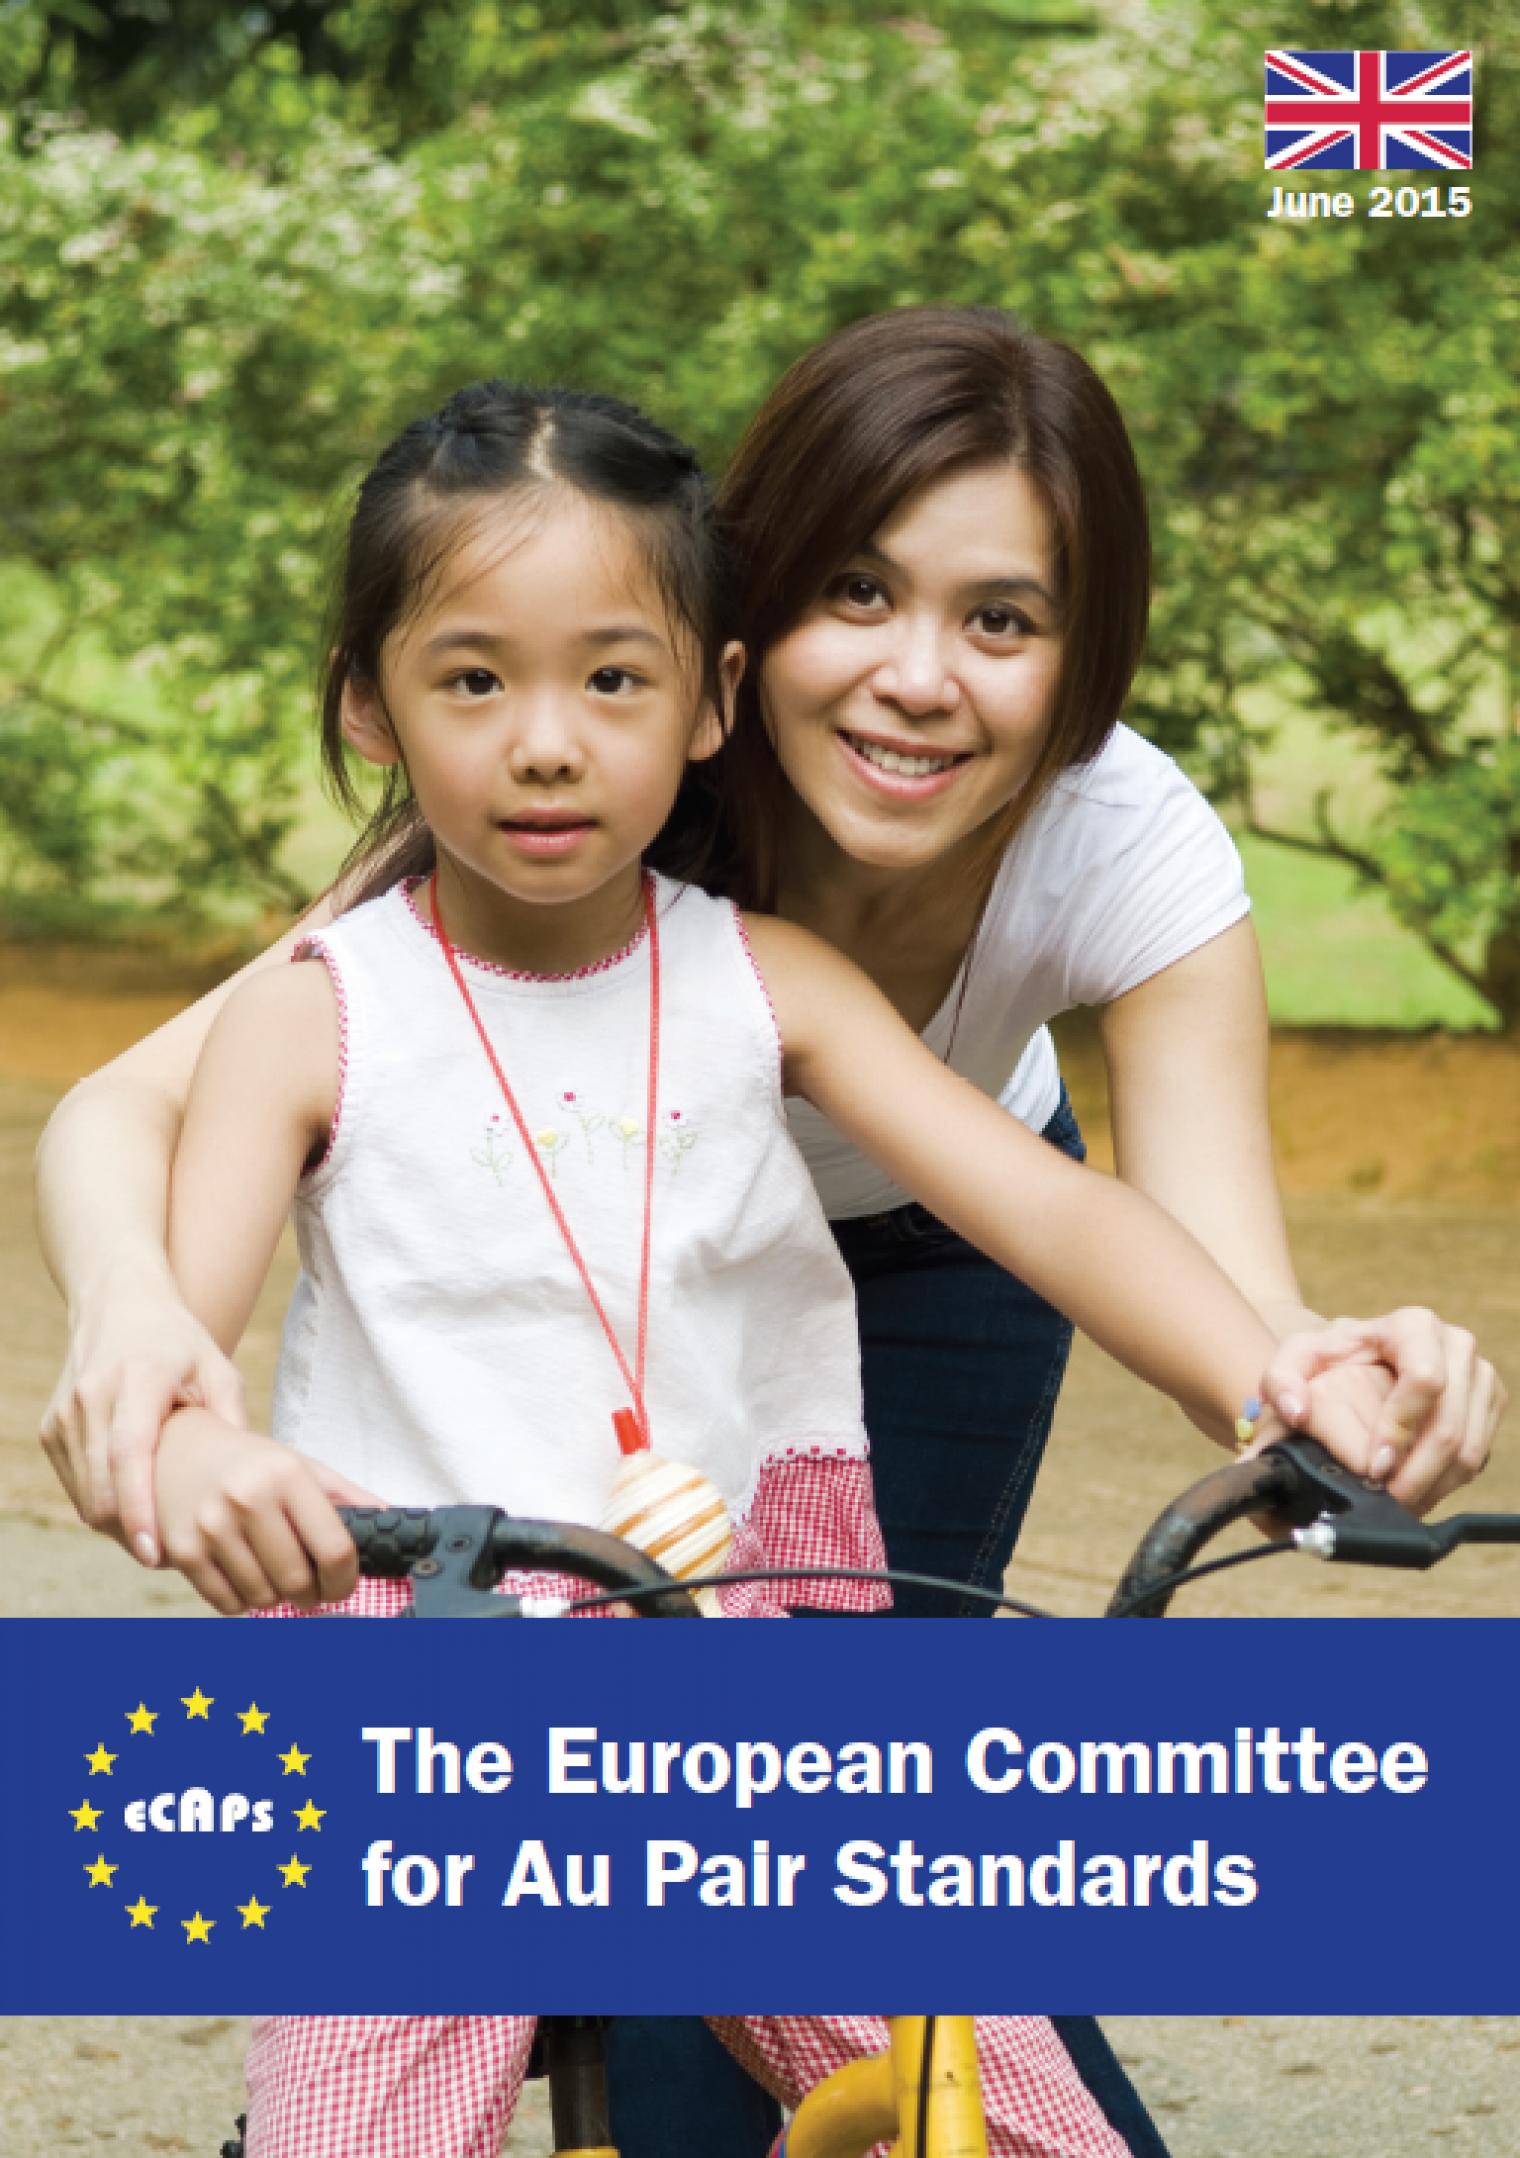 ECAPS – Revised guidelines booklet published